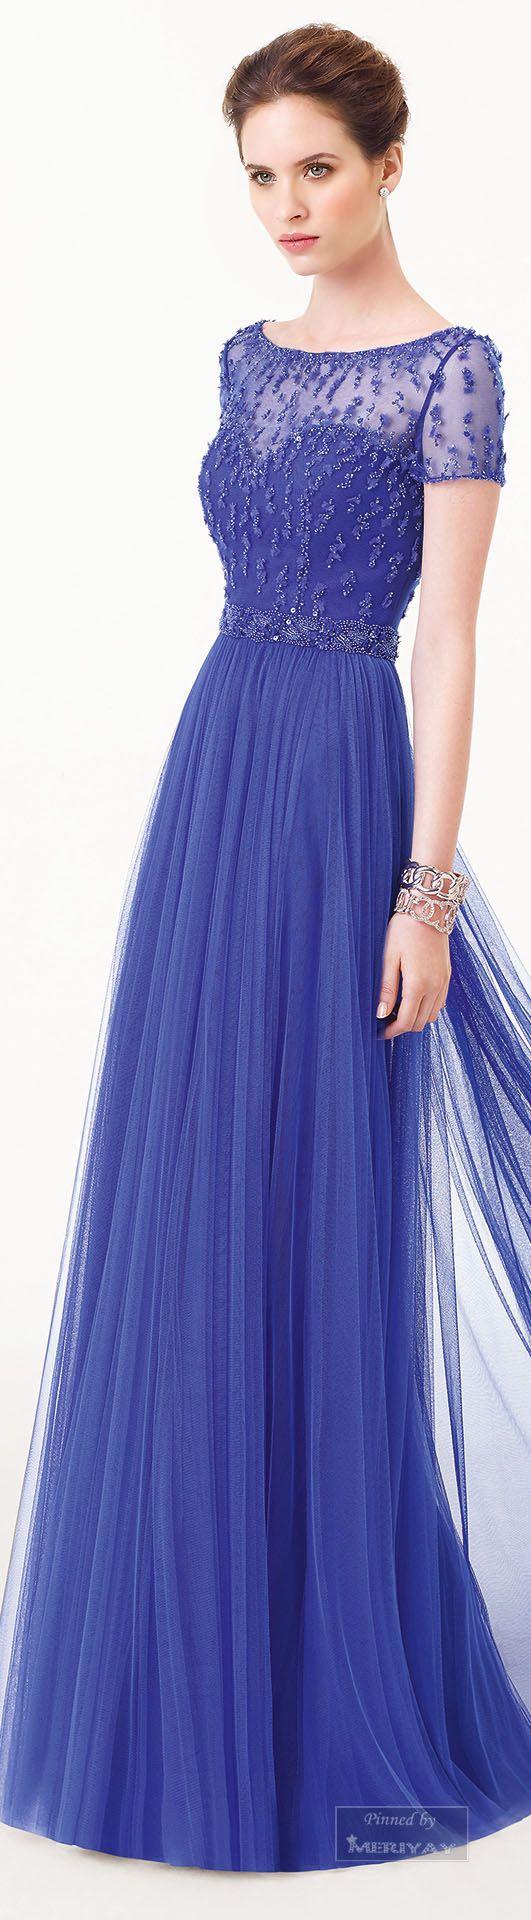 Único Marina Vestidos De Azul Prom 2014 Motivo - Ideas de Estilos de ...